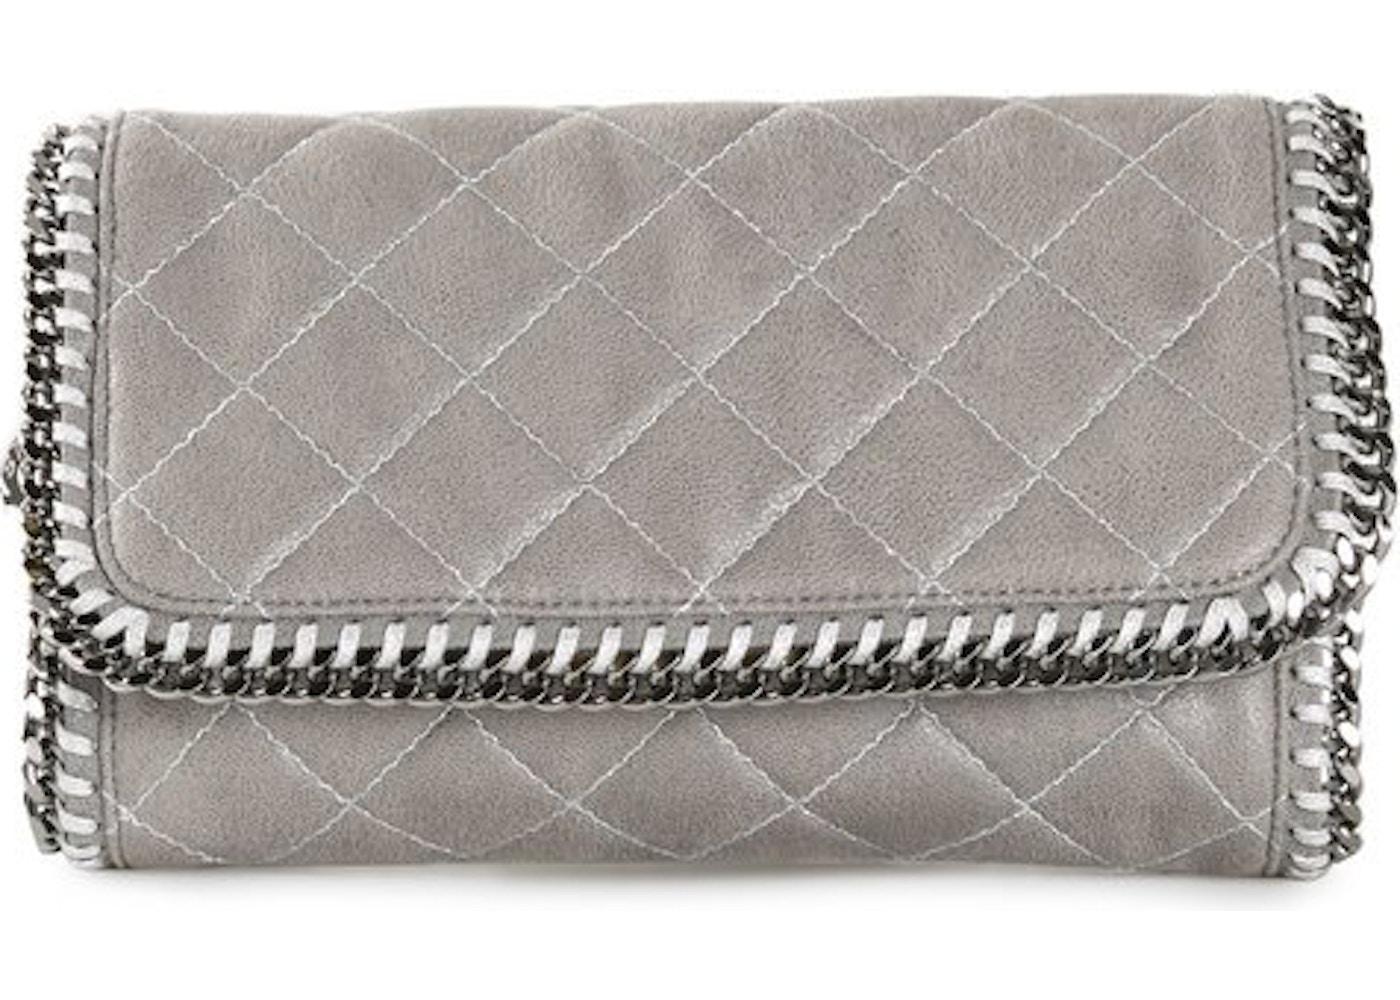 100c109024 Buy   Sell Luxury Handbags